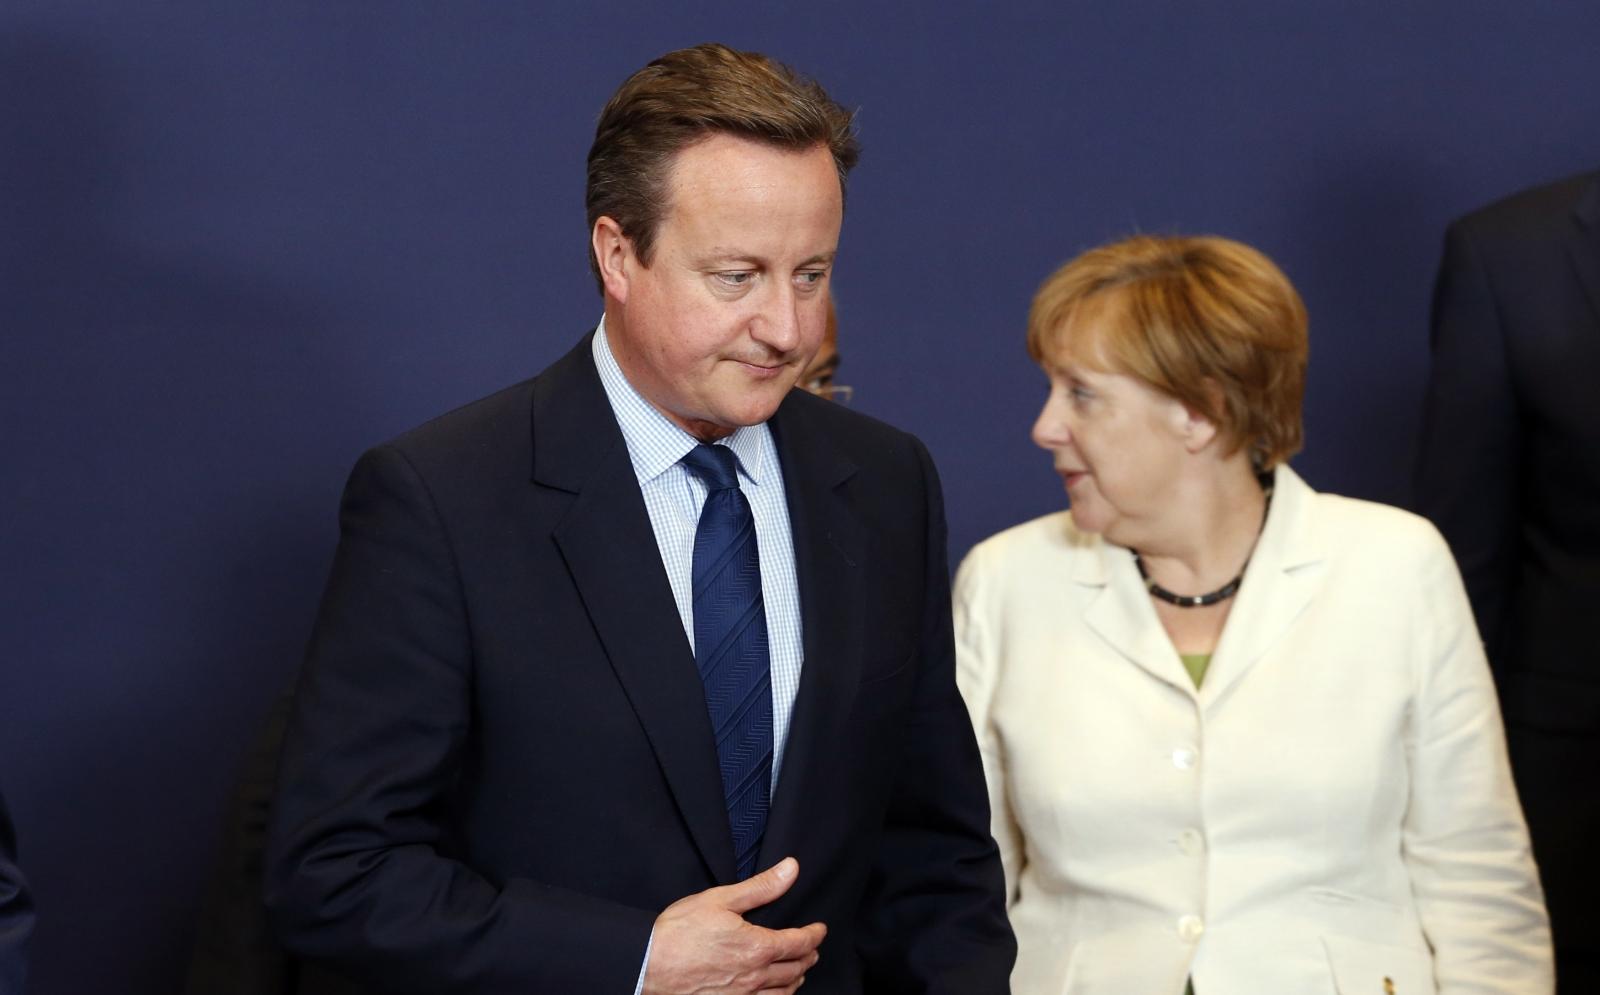 David Cameron & Angela Merkel